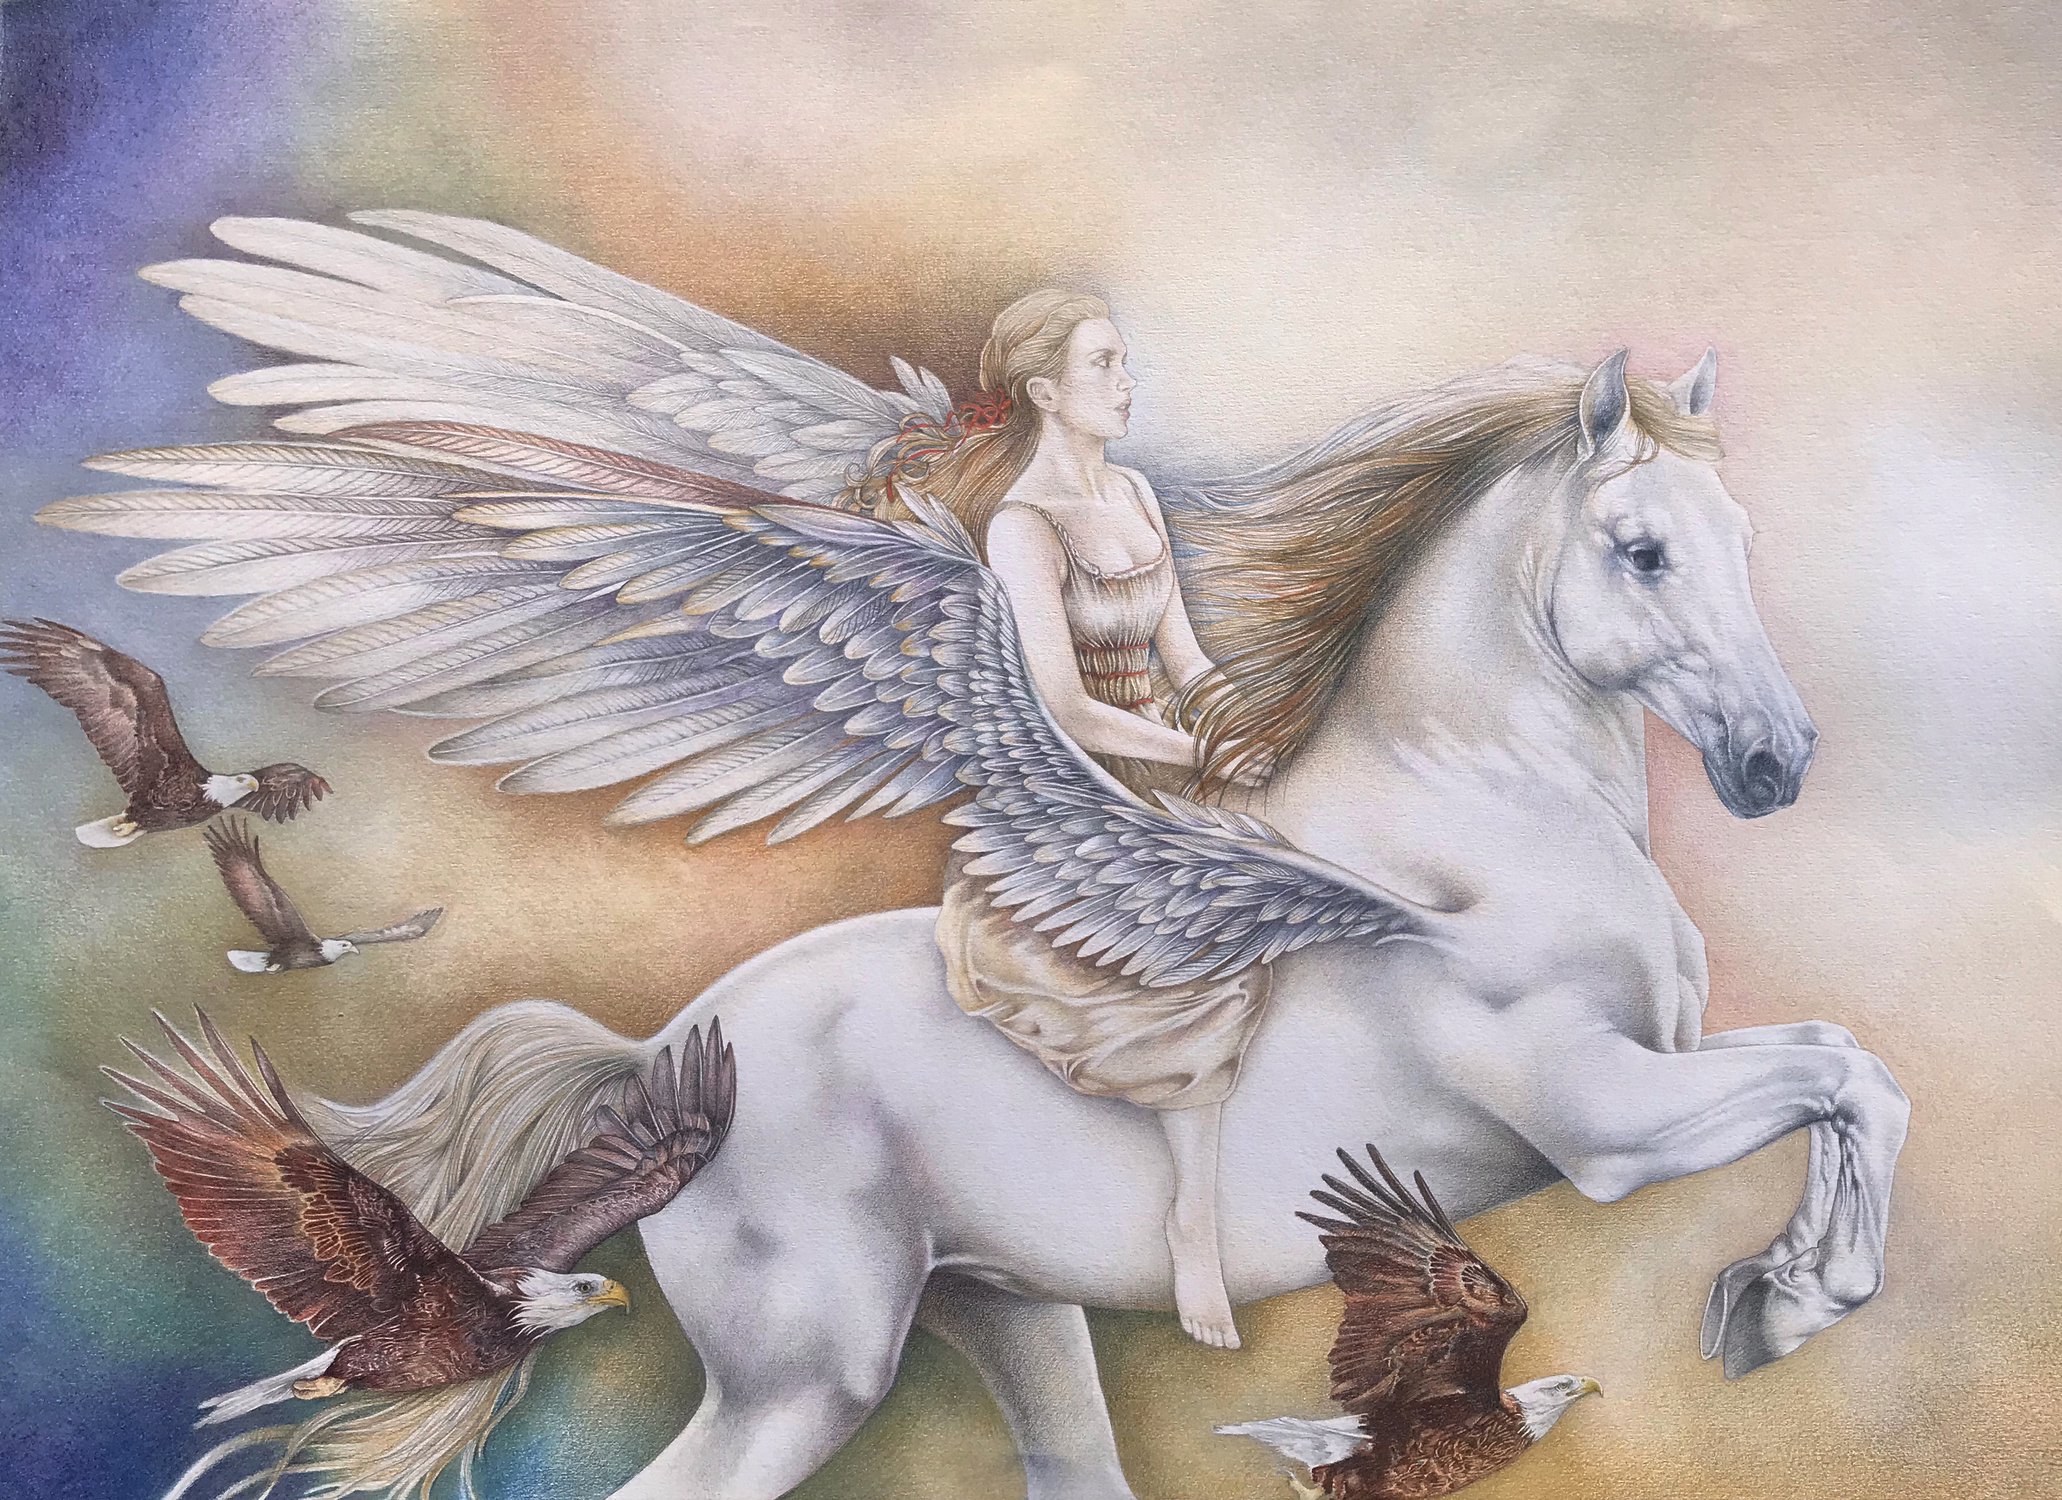 The Dreaming Girl Artwork by Bonnie Helen Hawkins